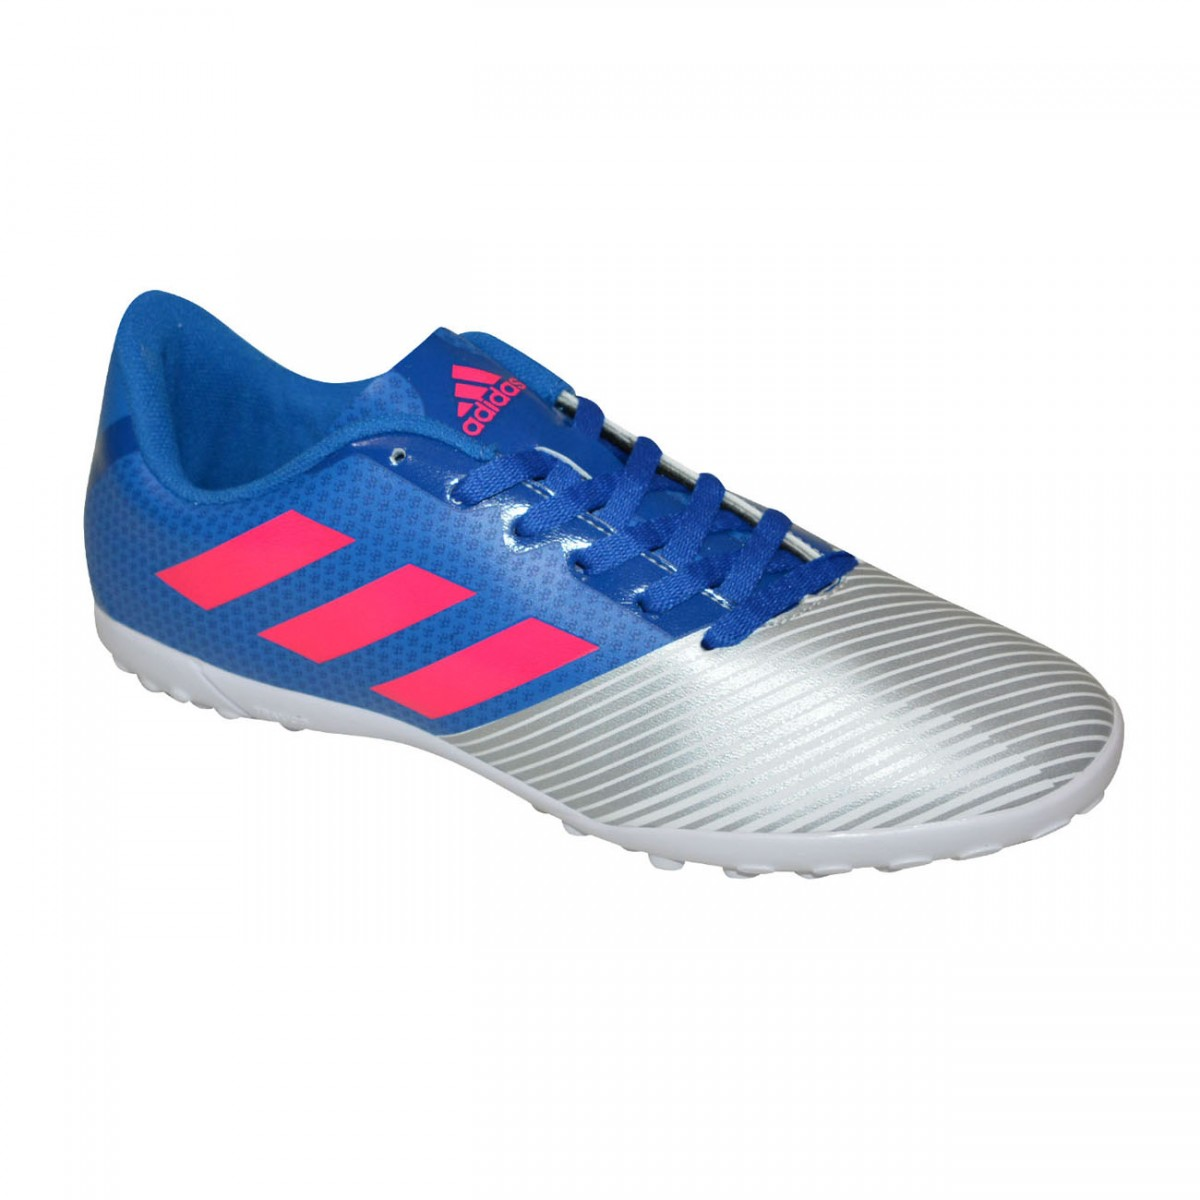 585d82bf4b Chuteira Society Adidas Artilheira II Juvenil H68445 - Azul Prata - Chuteira  Nike